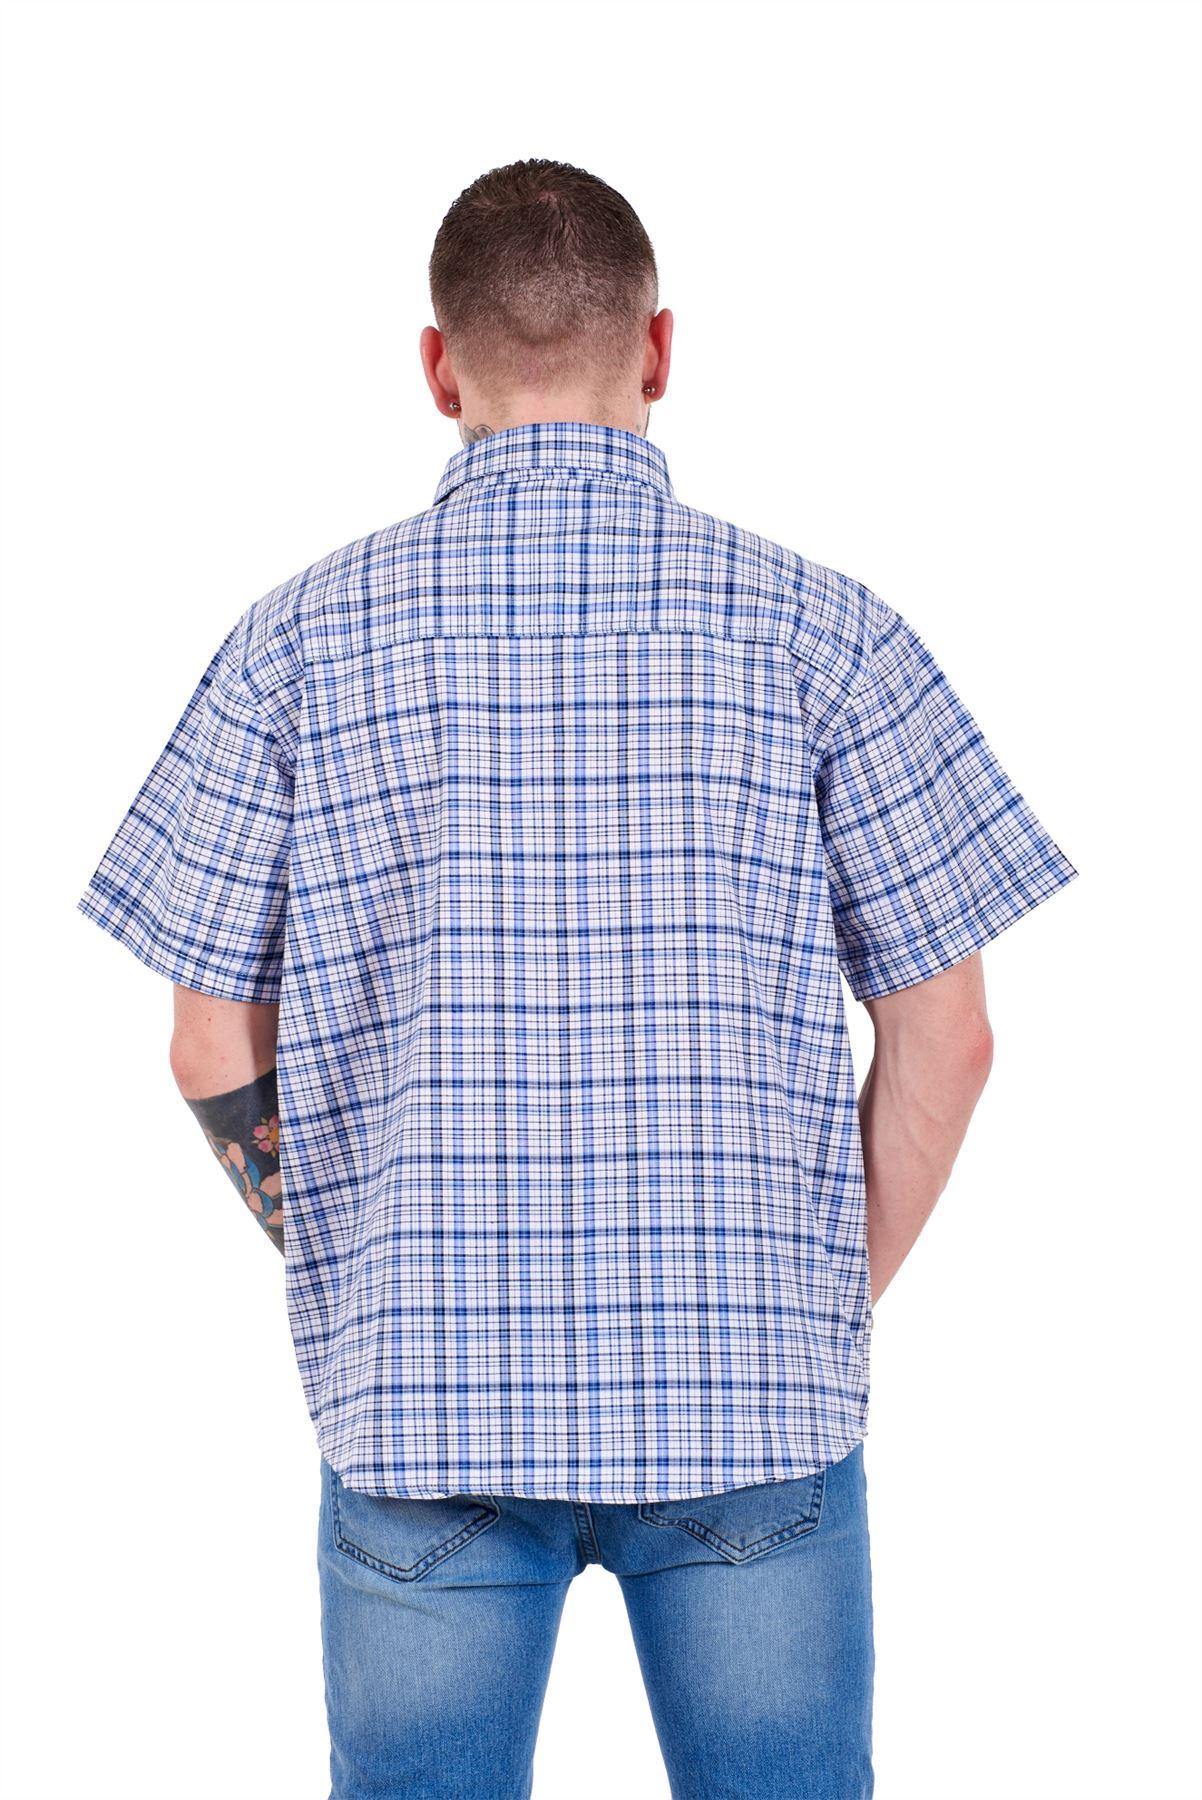 Mens-Regular-Big-Size-Shirts-Checked-Cotton-Blend-Casual-Short-Sleeve-M-to-5XL thumbnail 5